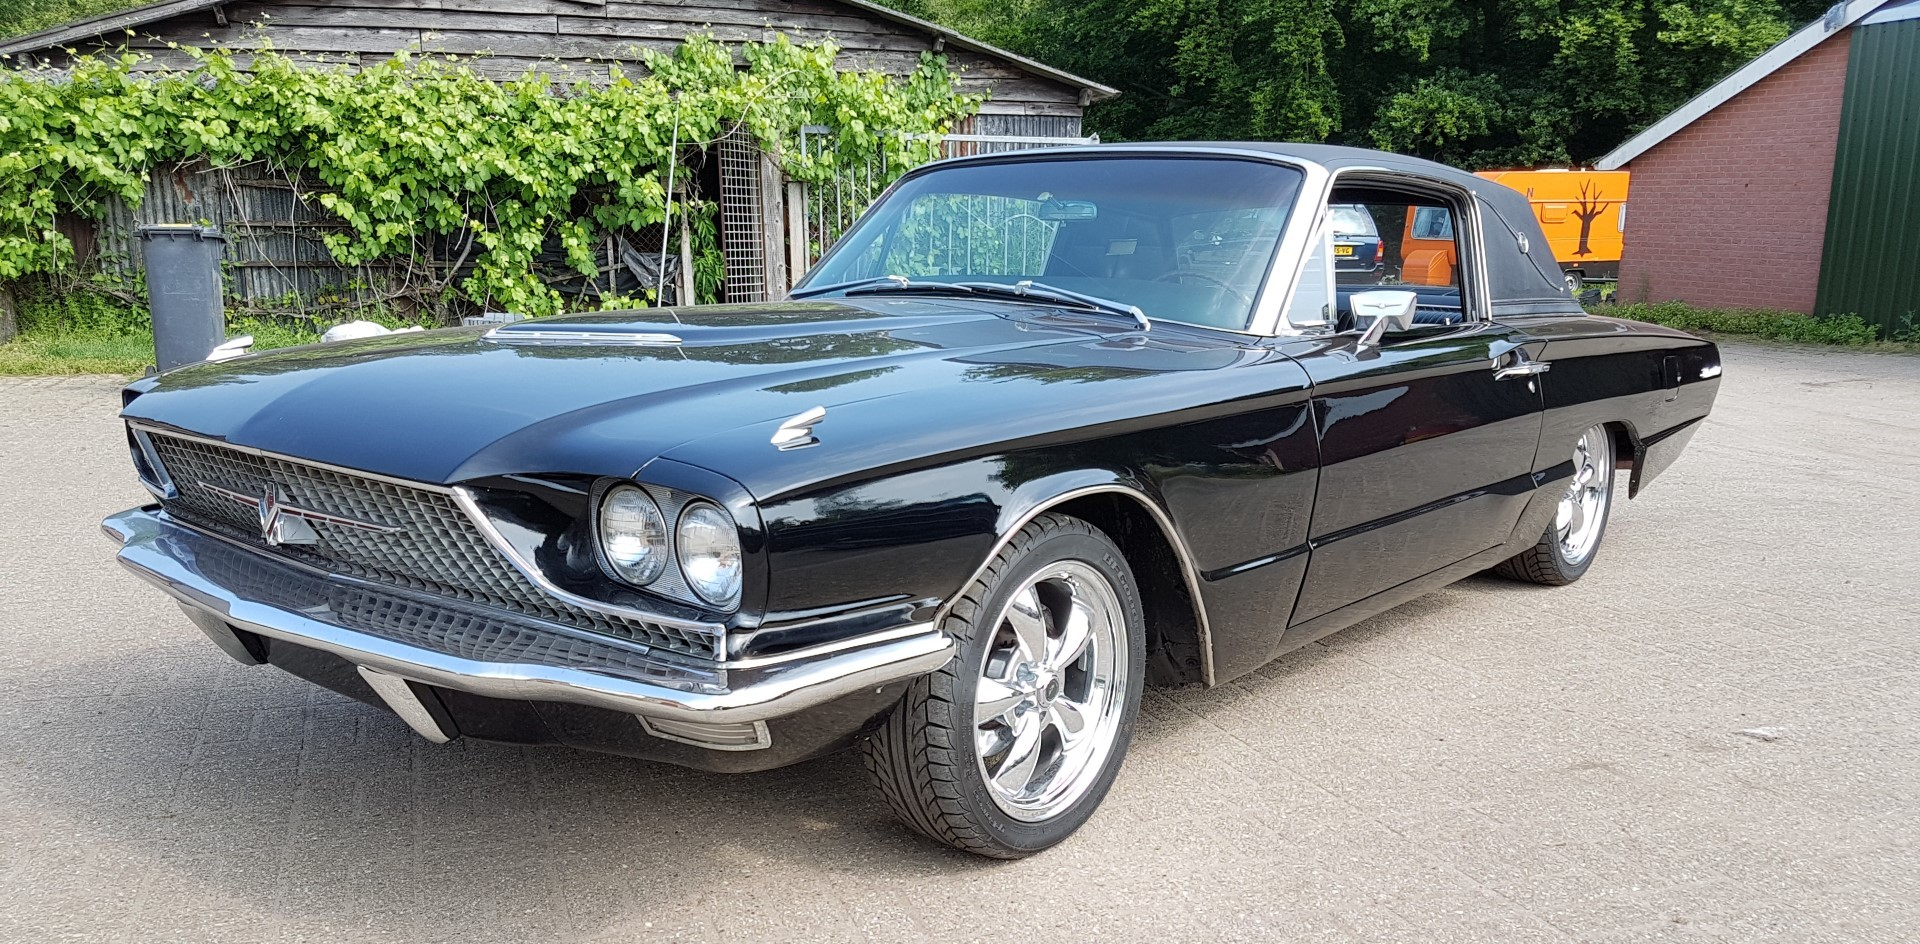 1966 Ford Thunderbird Town Landau triple black - 390ci (29)